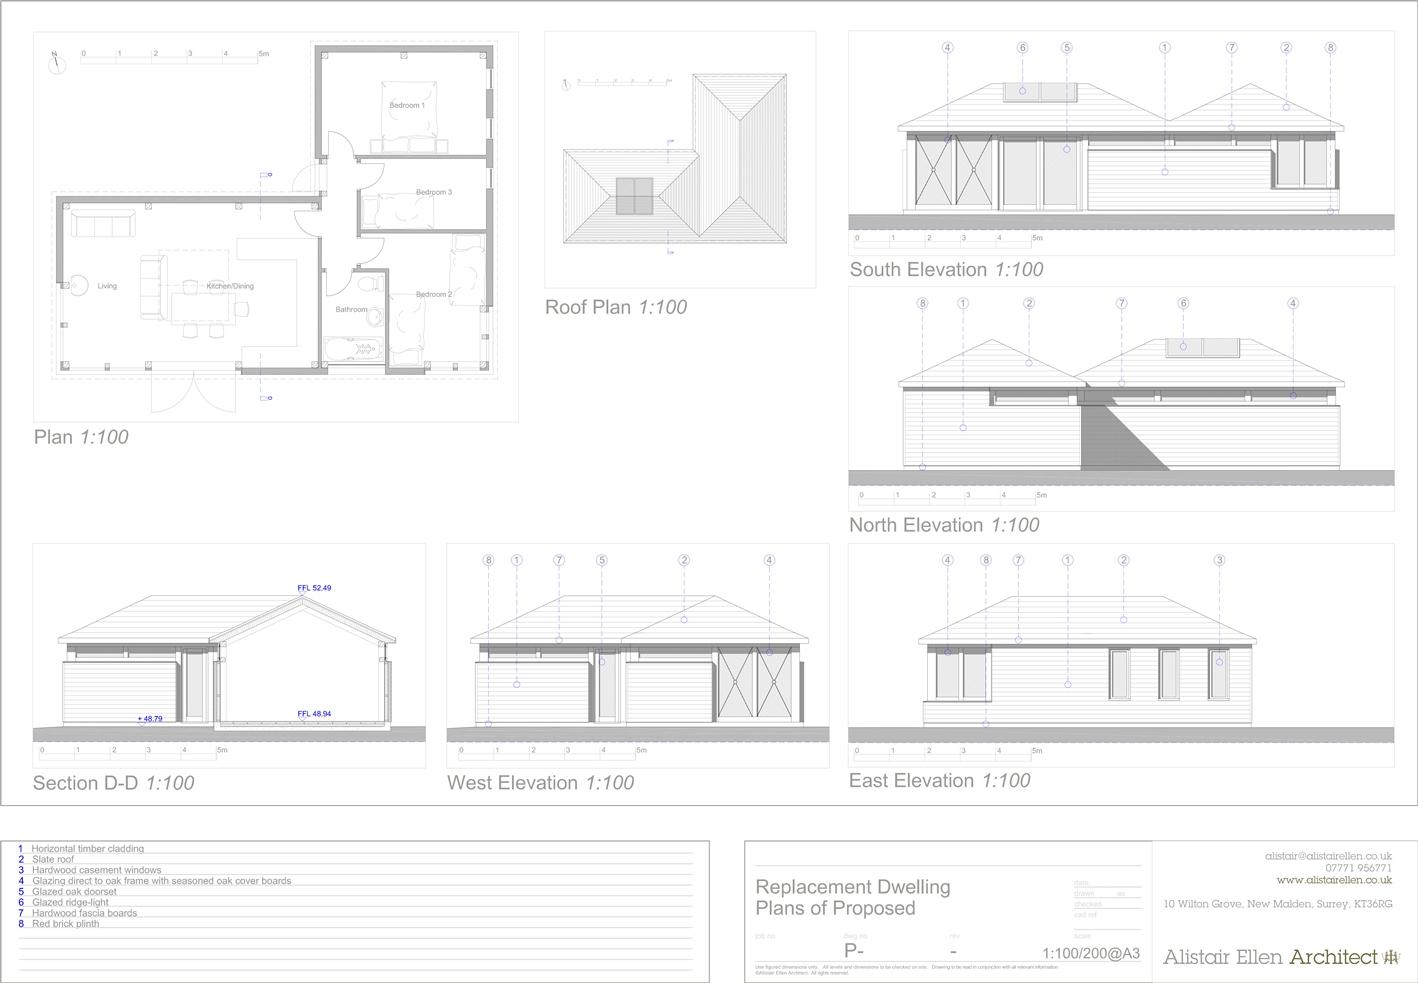 C:UsersOwnerAlistair Ellen ArchitectsProject211 LeechDrawings211-08- planning 2 Plans (1)